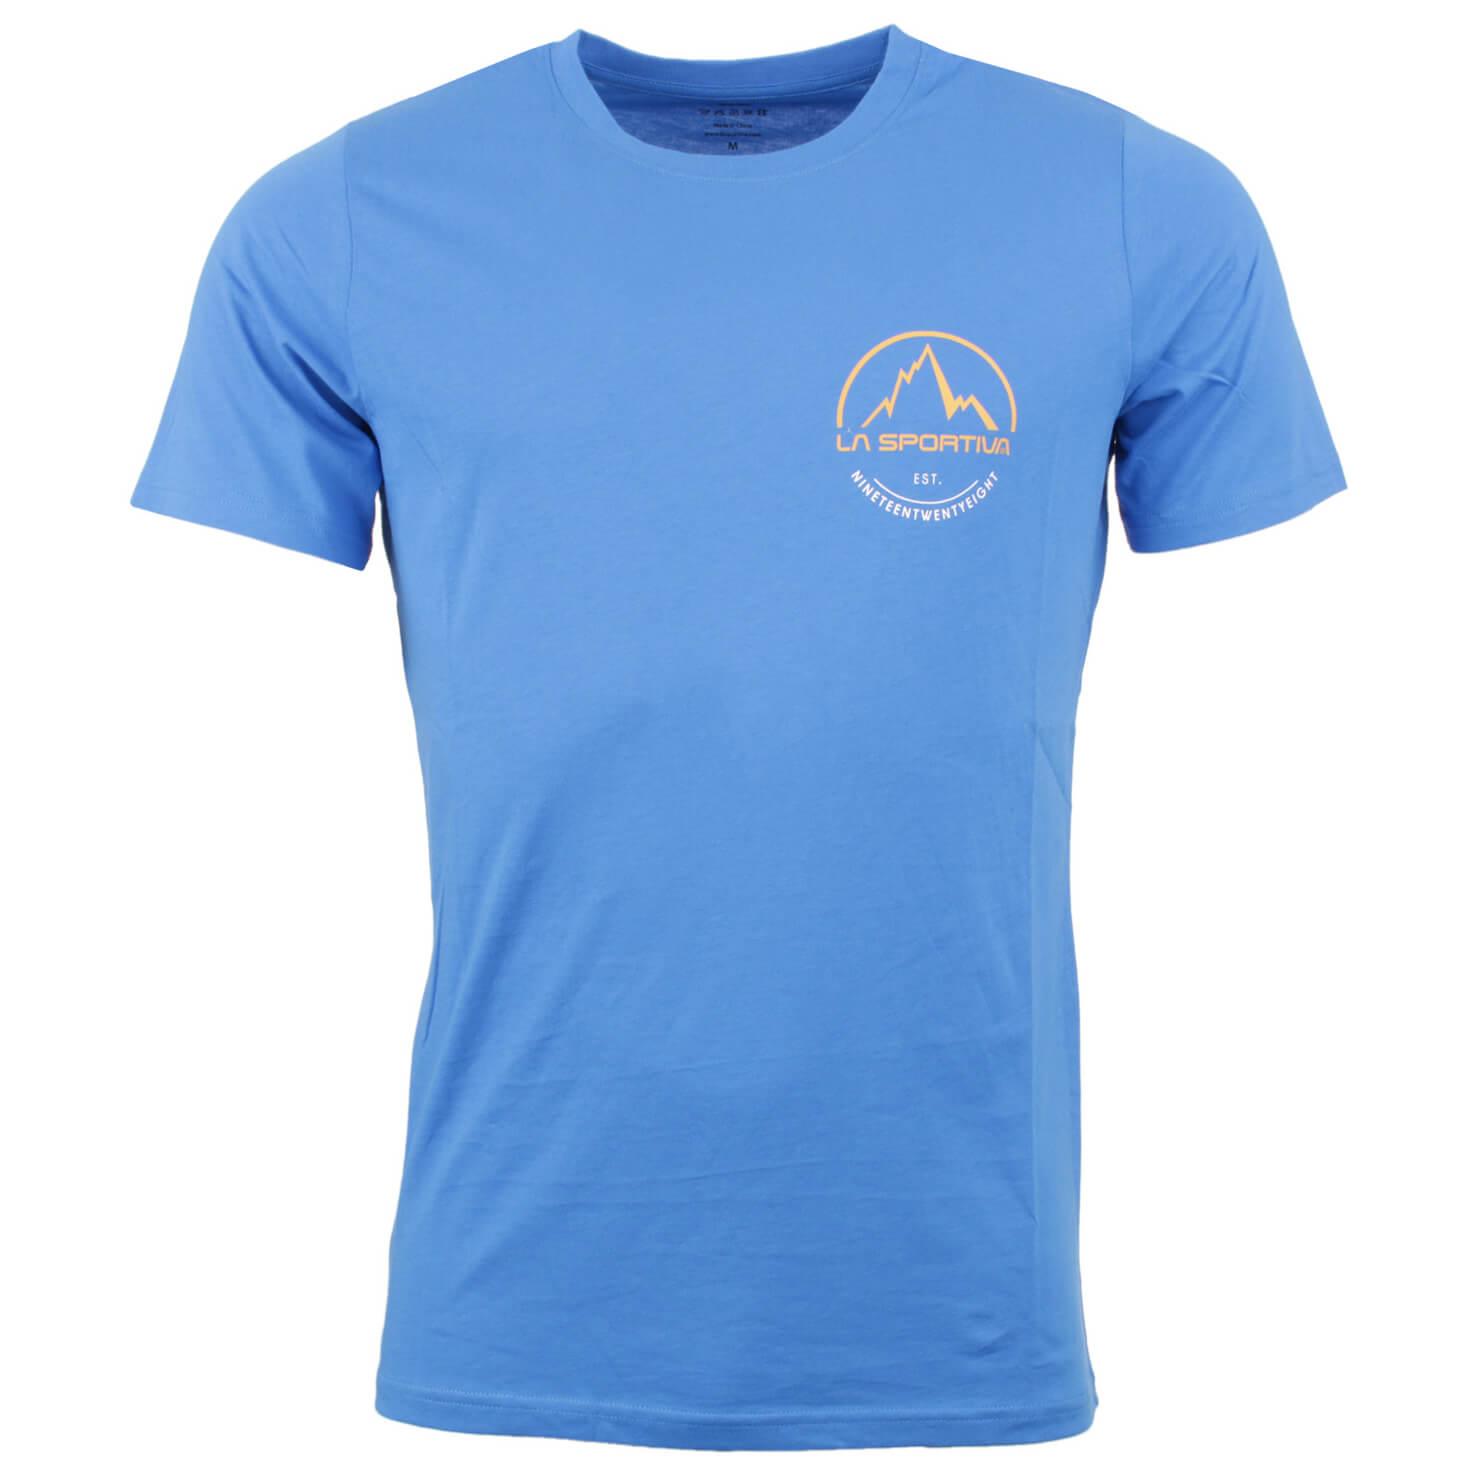 La sportiva small logo tee t shirt men 39 s buy online for Logo t shirts online